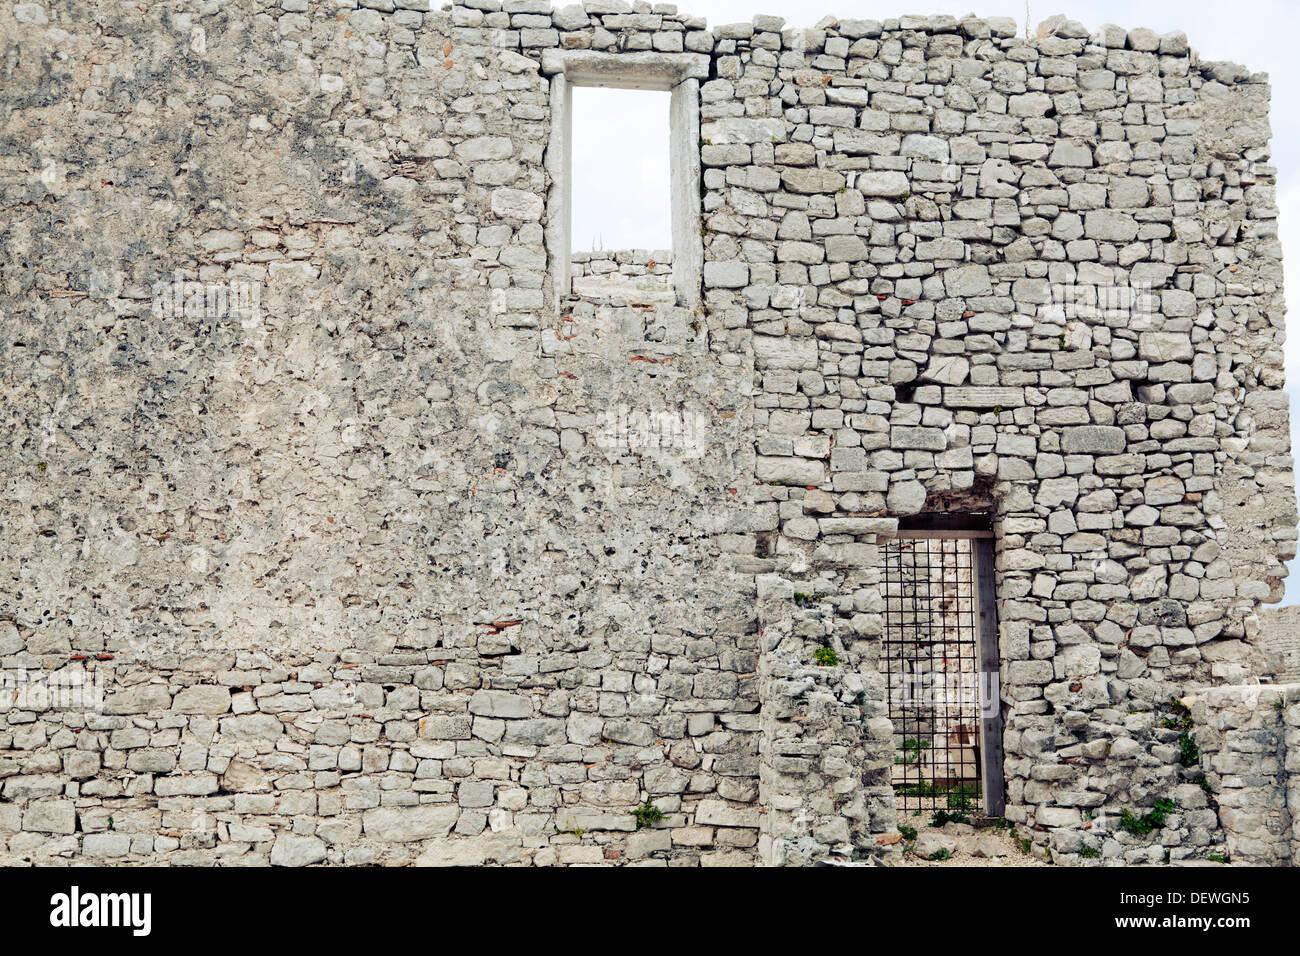 Old stone wall belonging to the ancient Venetian monastery in Osor, Cres island, Croatia - Stock Image